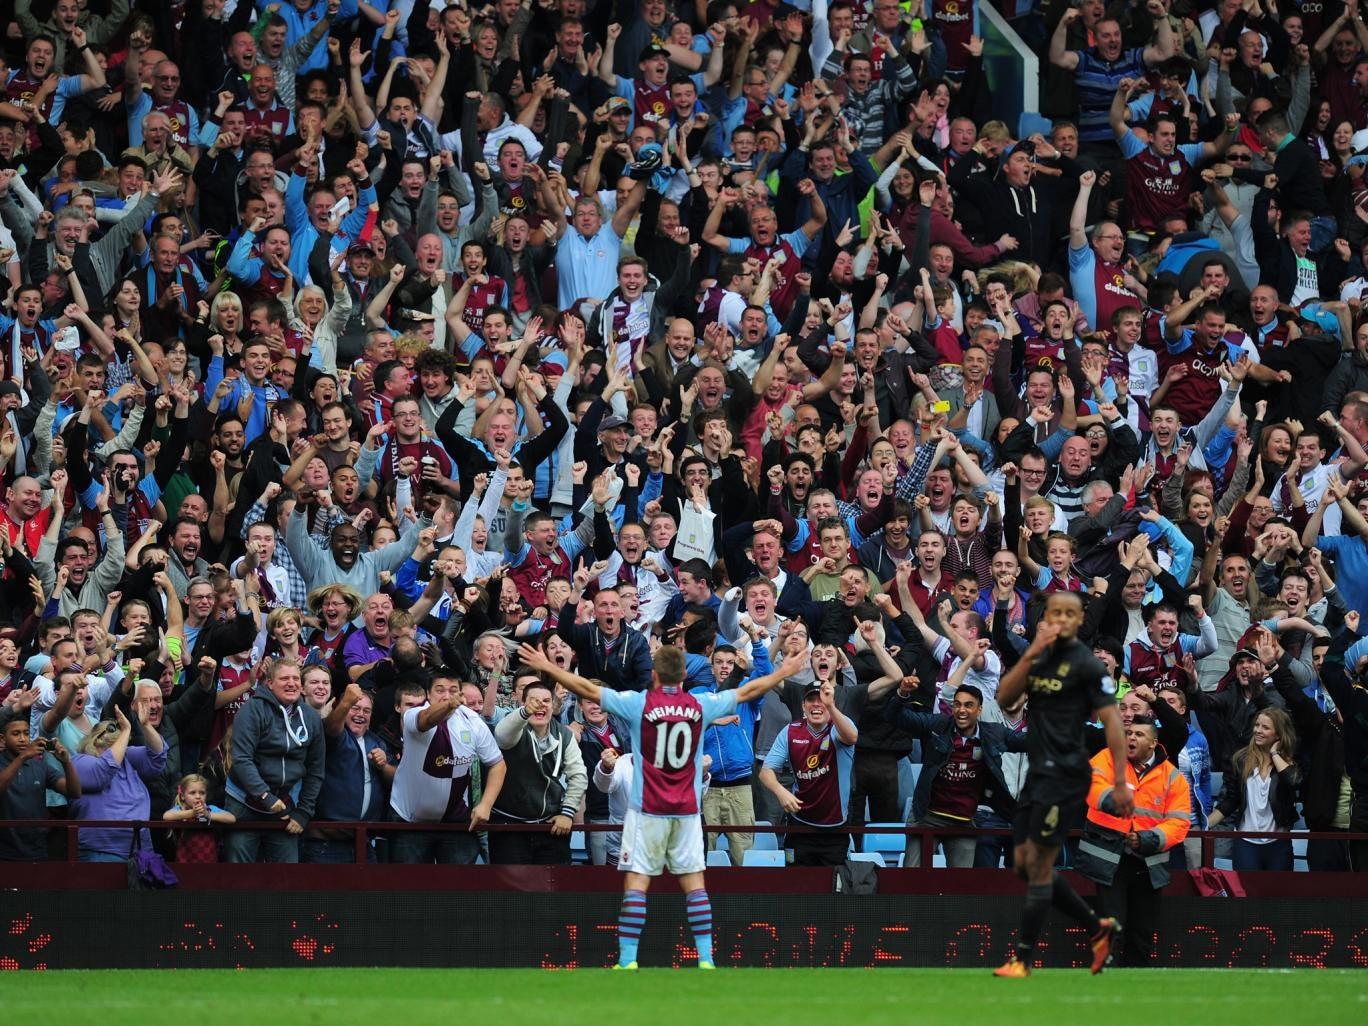 Andreas Weimann celebrates scoring the winner against Manchester City